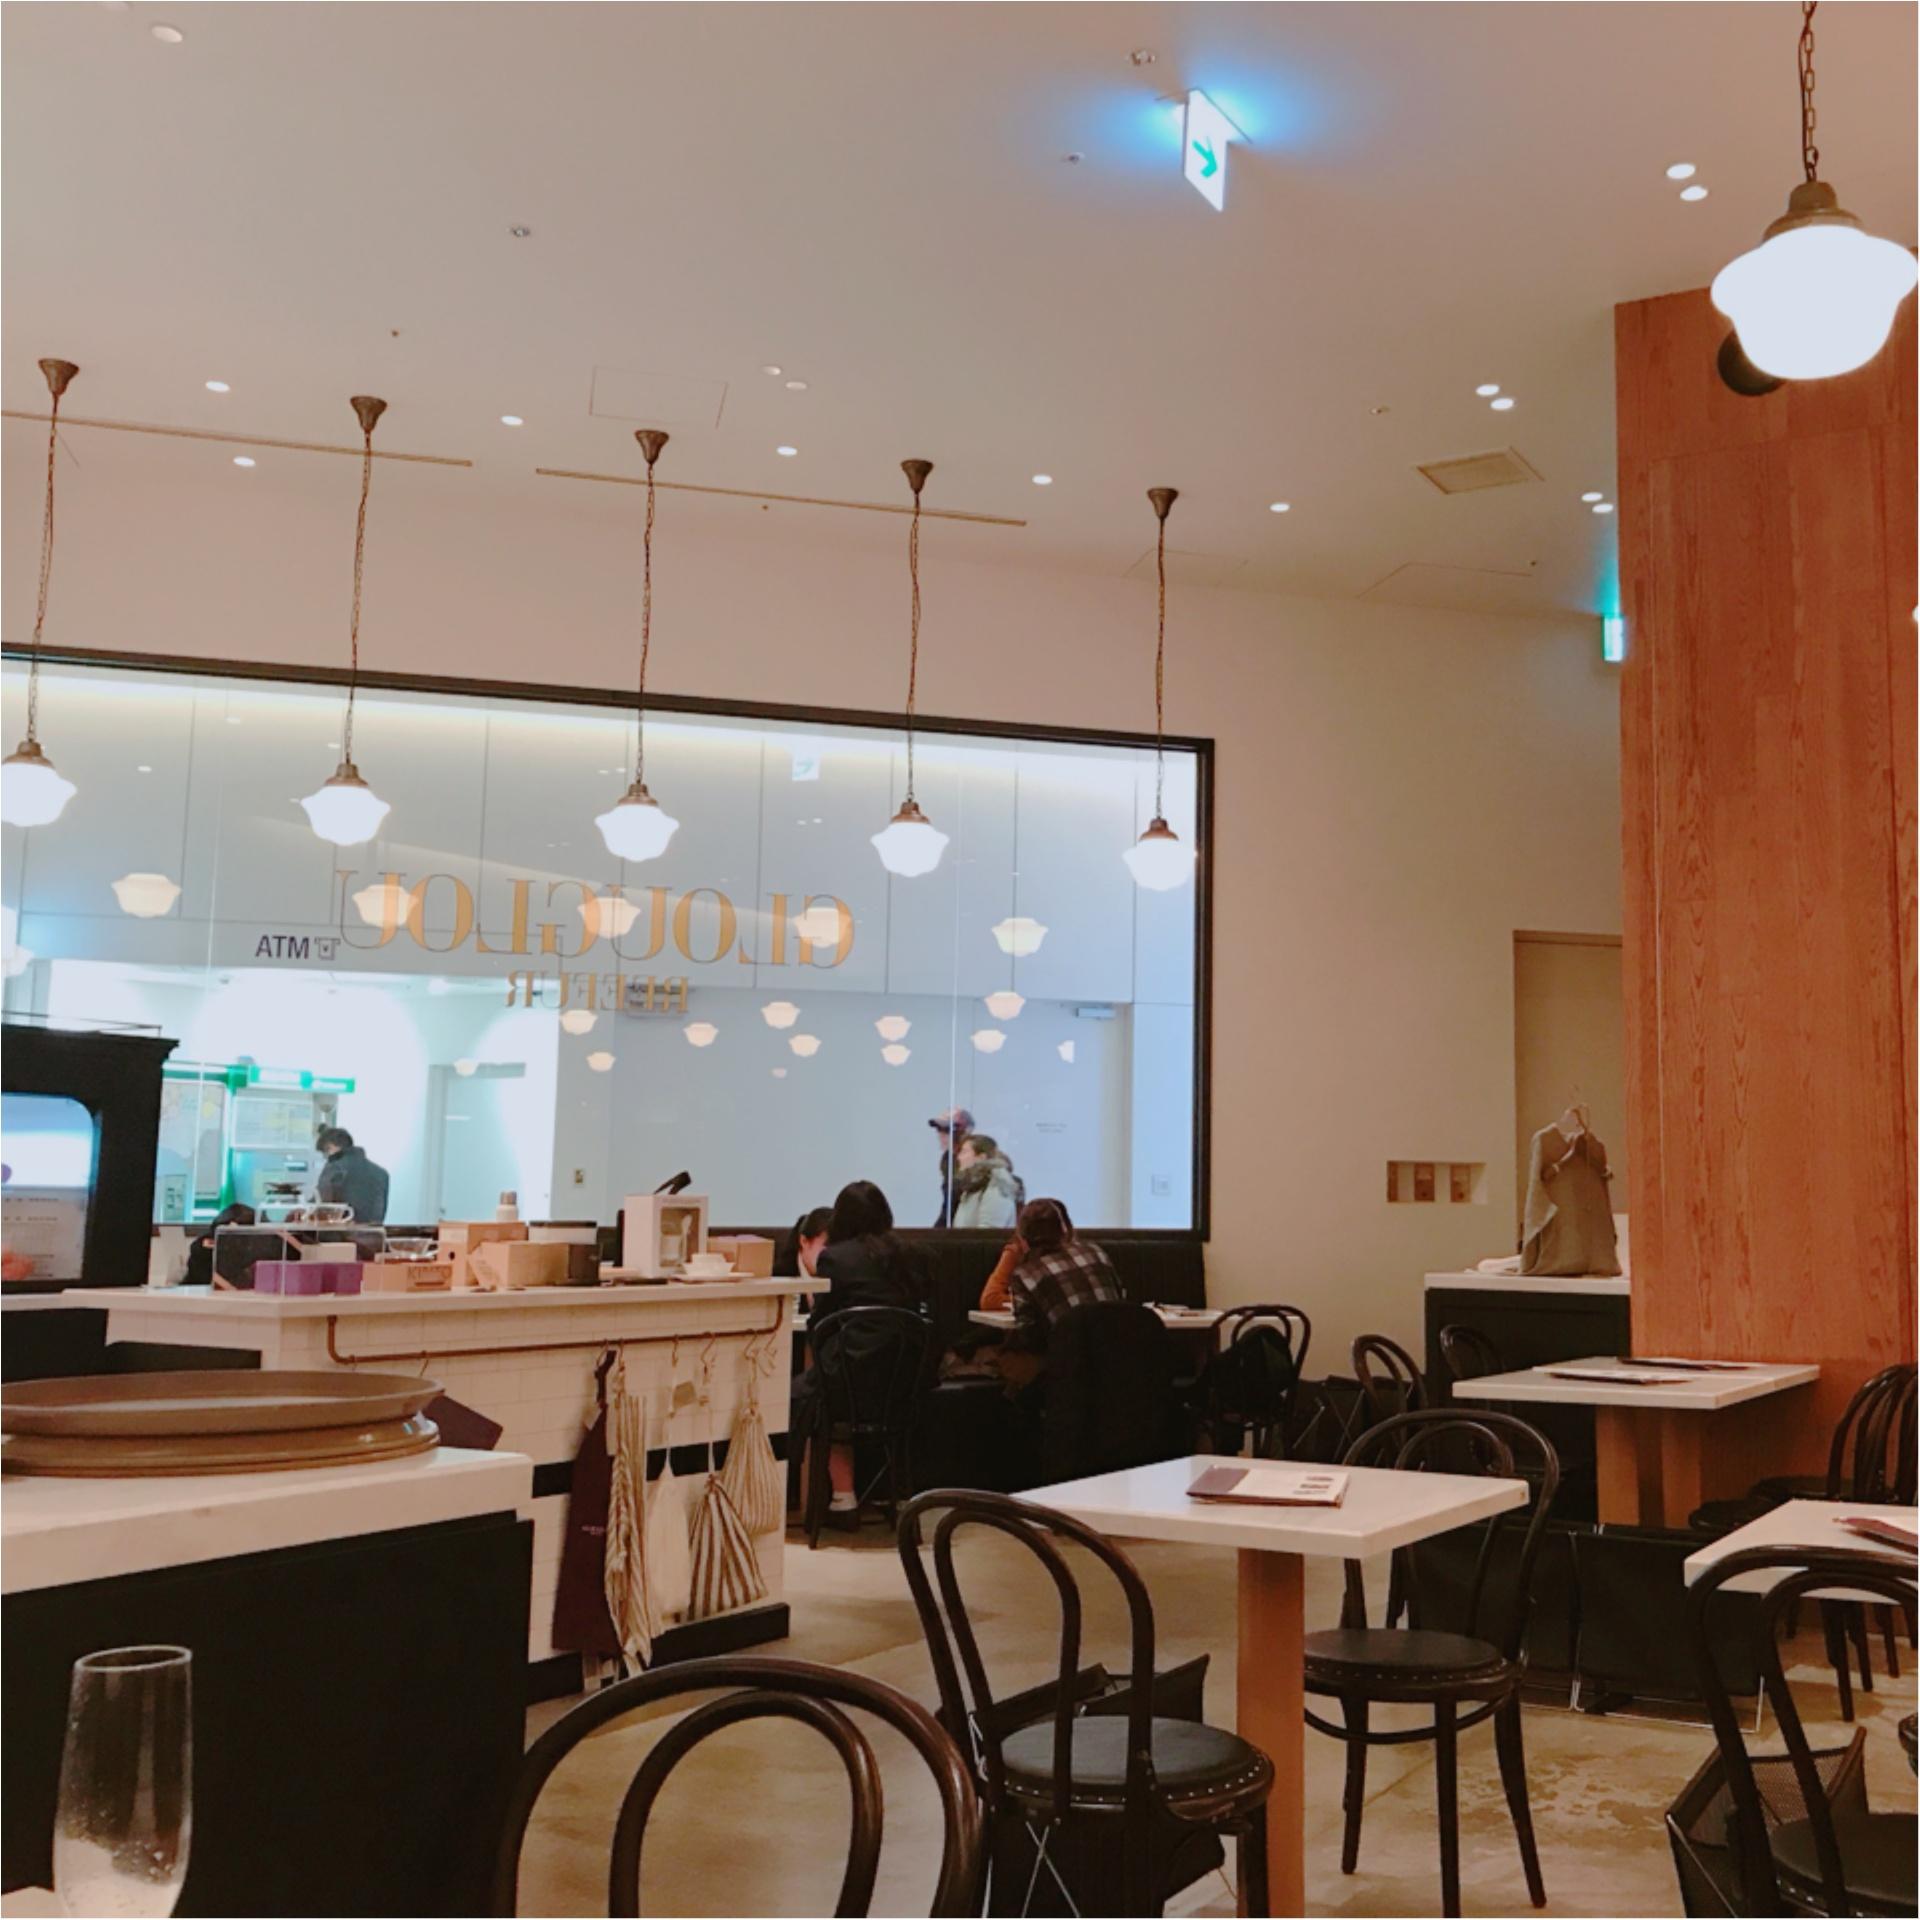 ★MAISON DE REEFURのカフェが名古屋にも上陸!私もようやく『GLOUGLOU REEFUR』へ行ってきました★_2